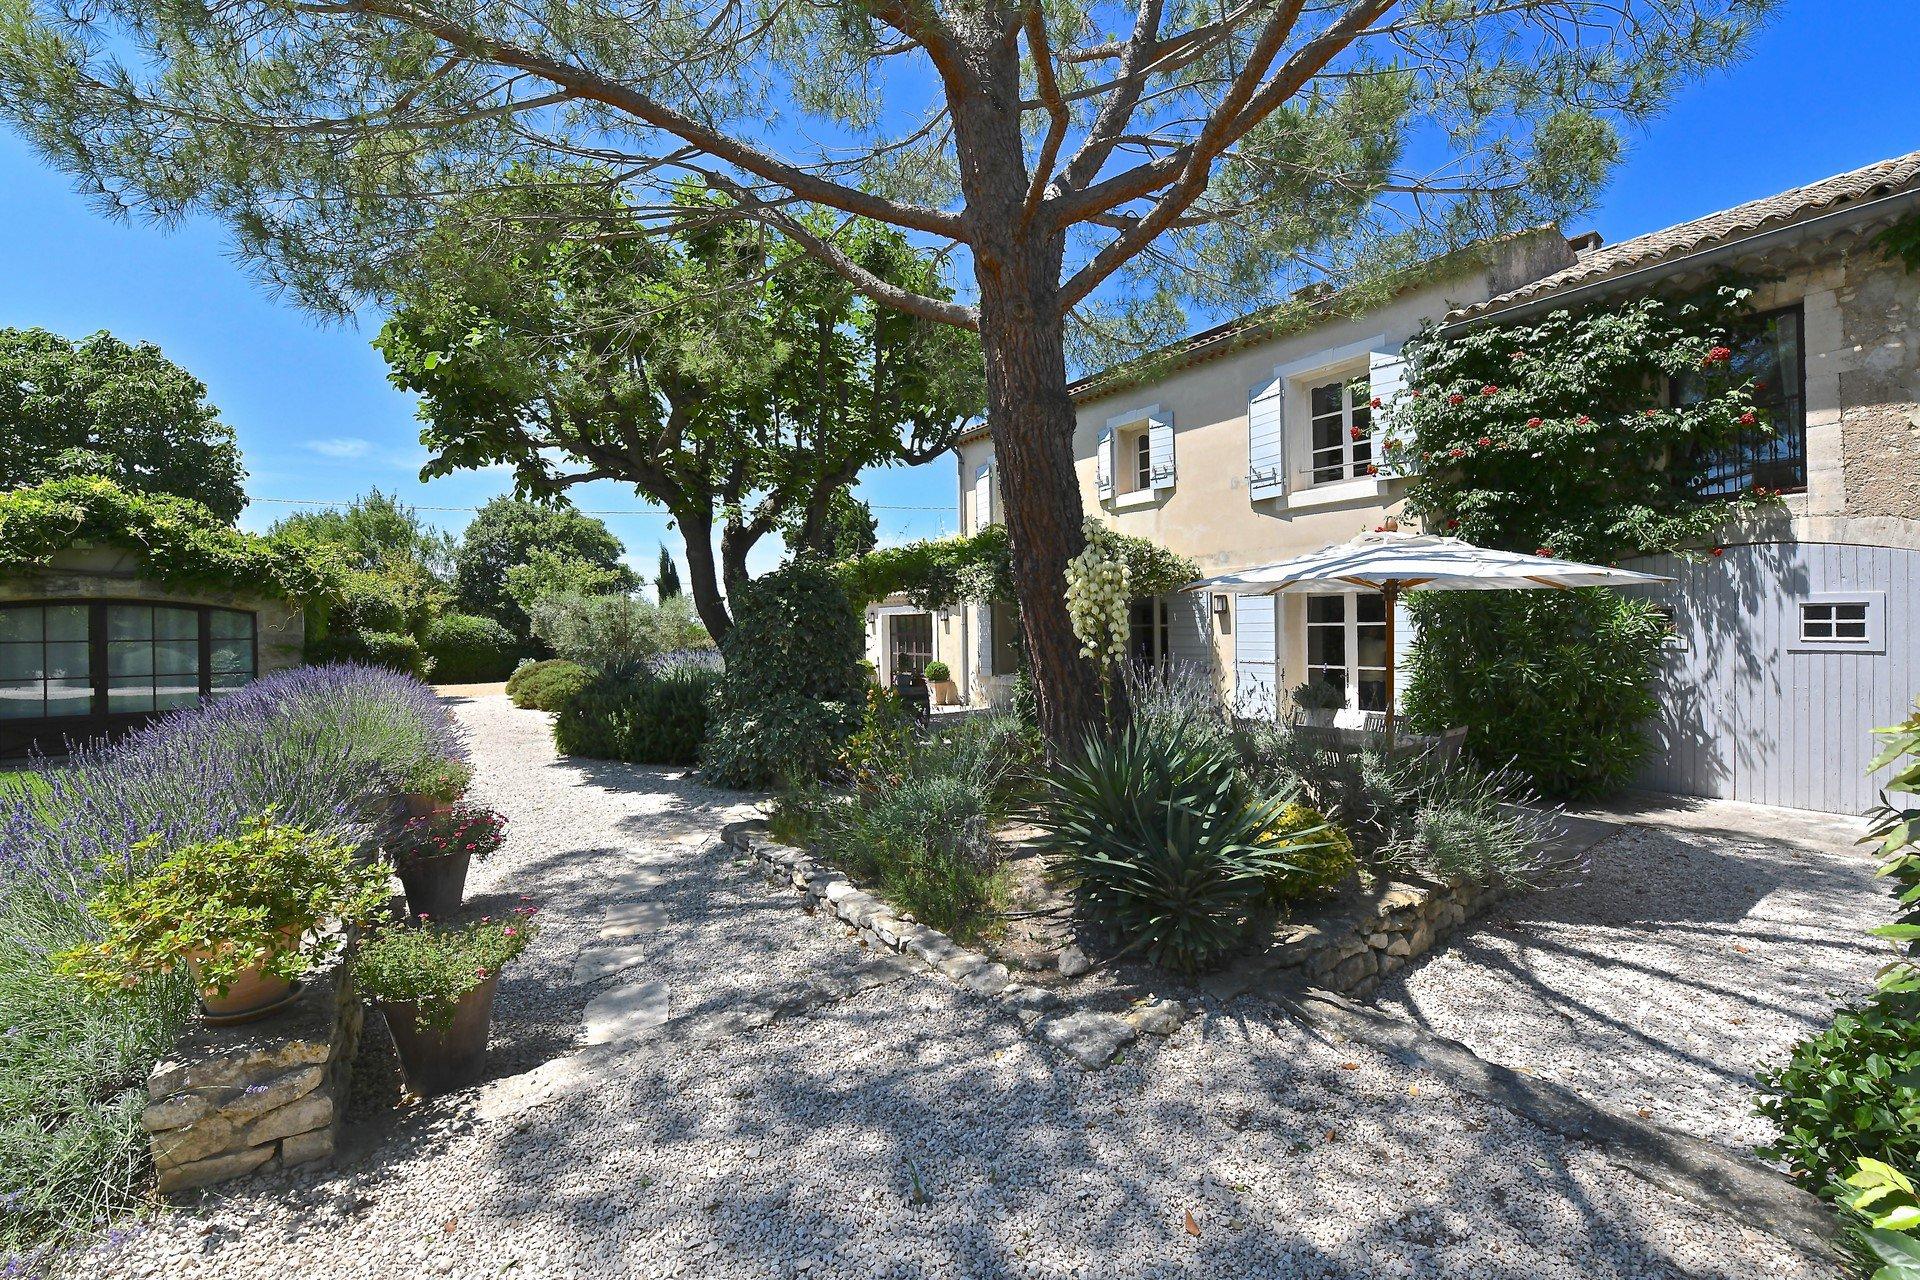 semi-detached property less than 1 km from the centre of Saint-Rémy-de-Provence